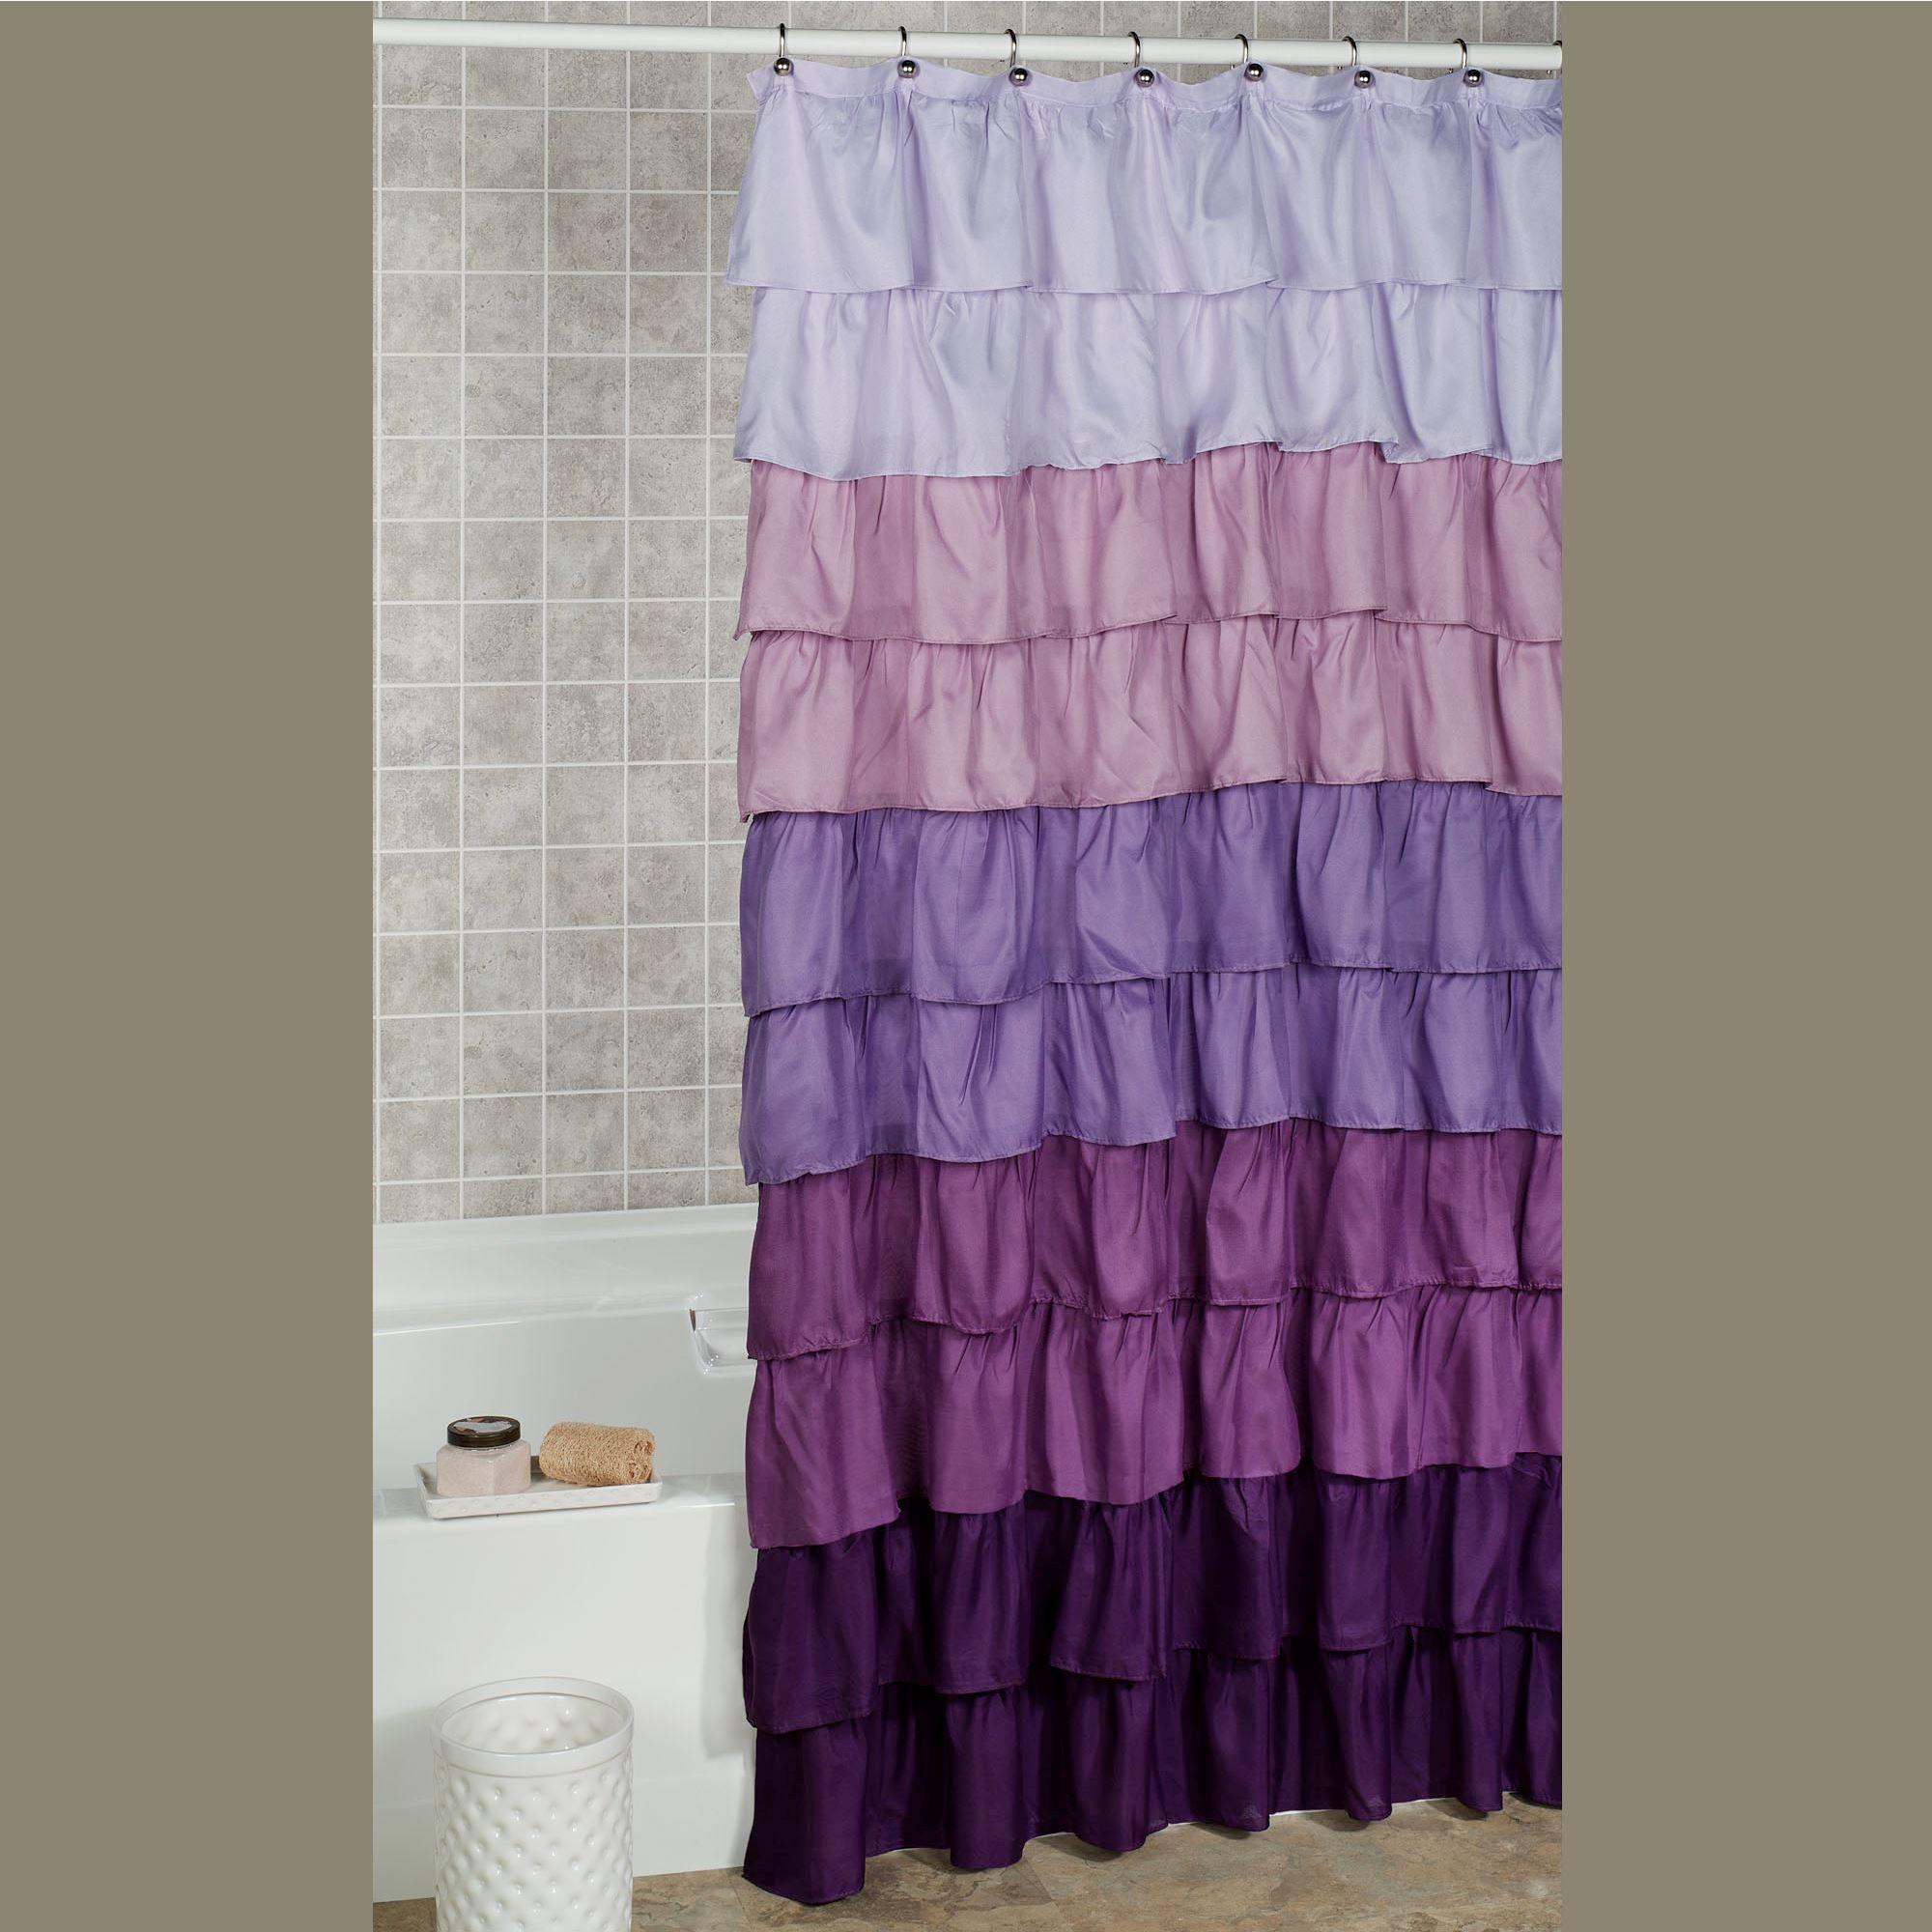 maribella lavender ombre ruffled shower curtain